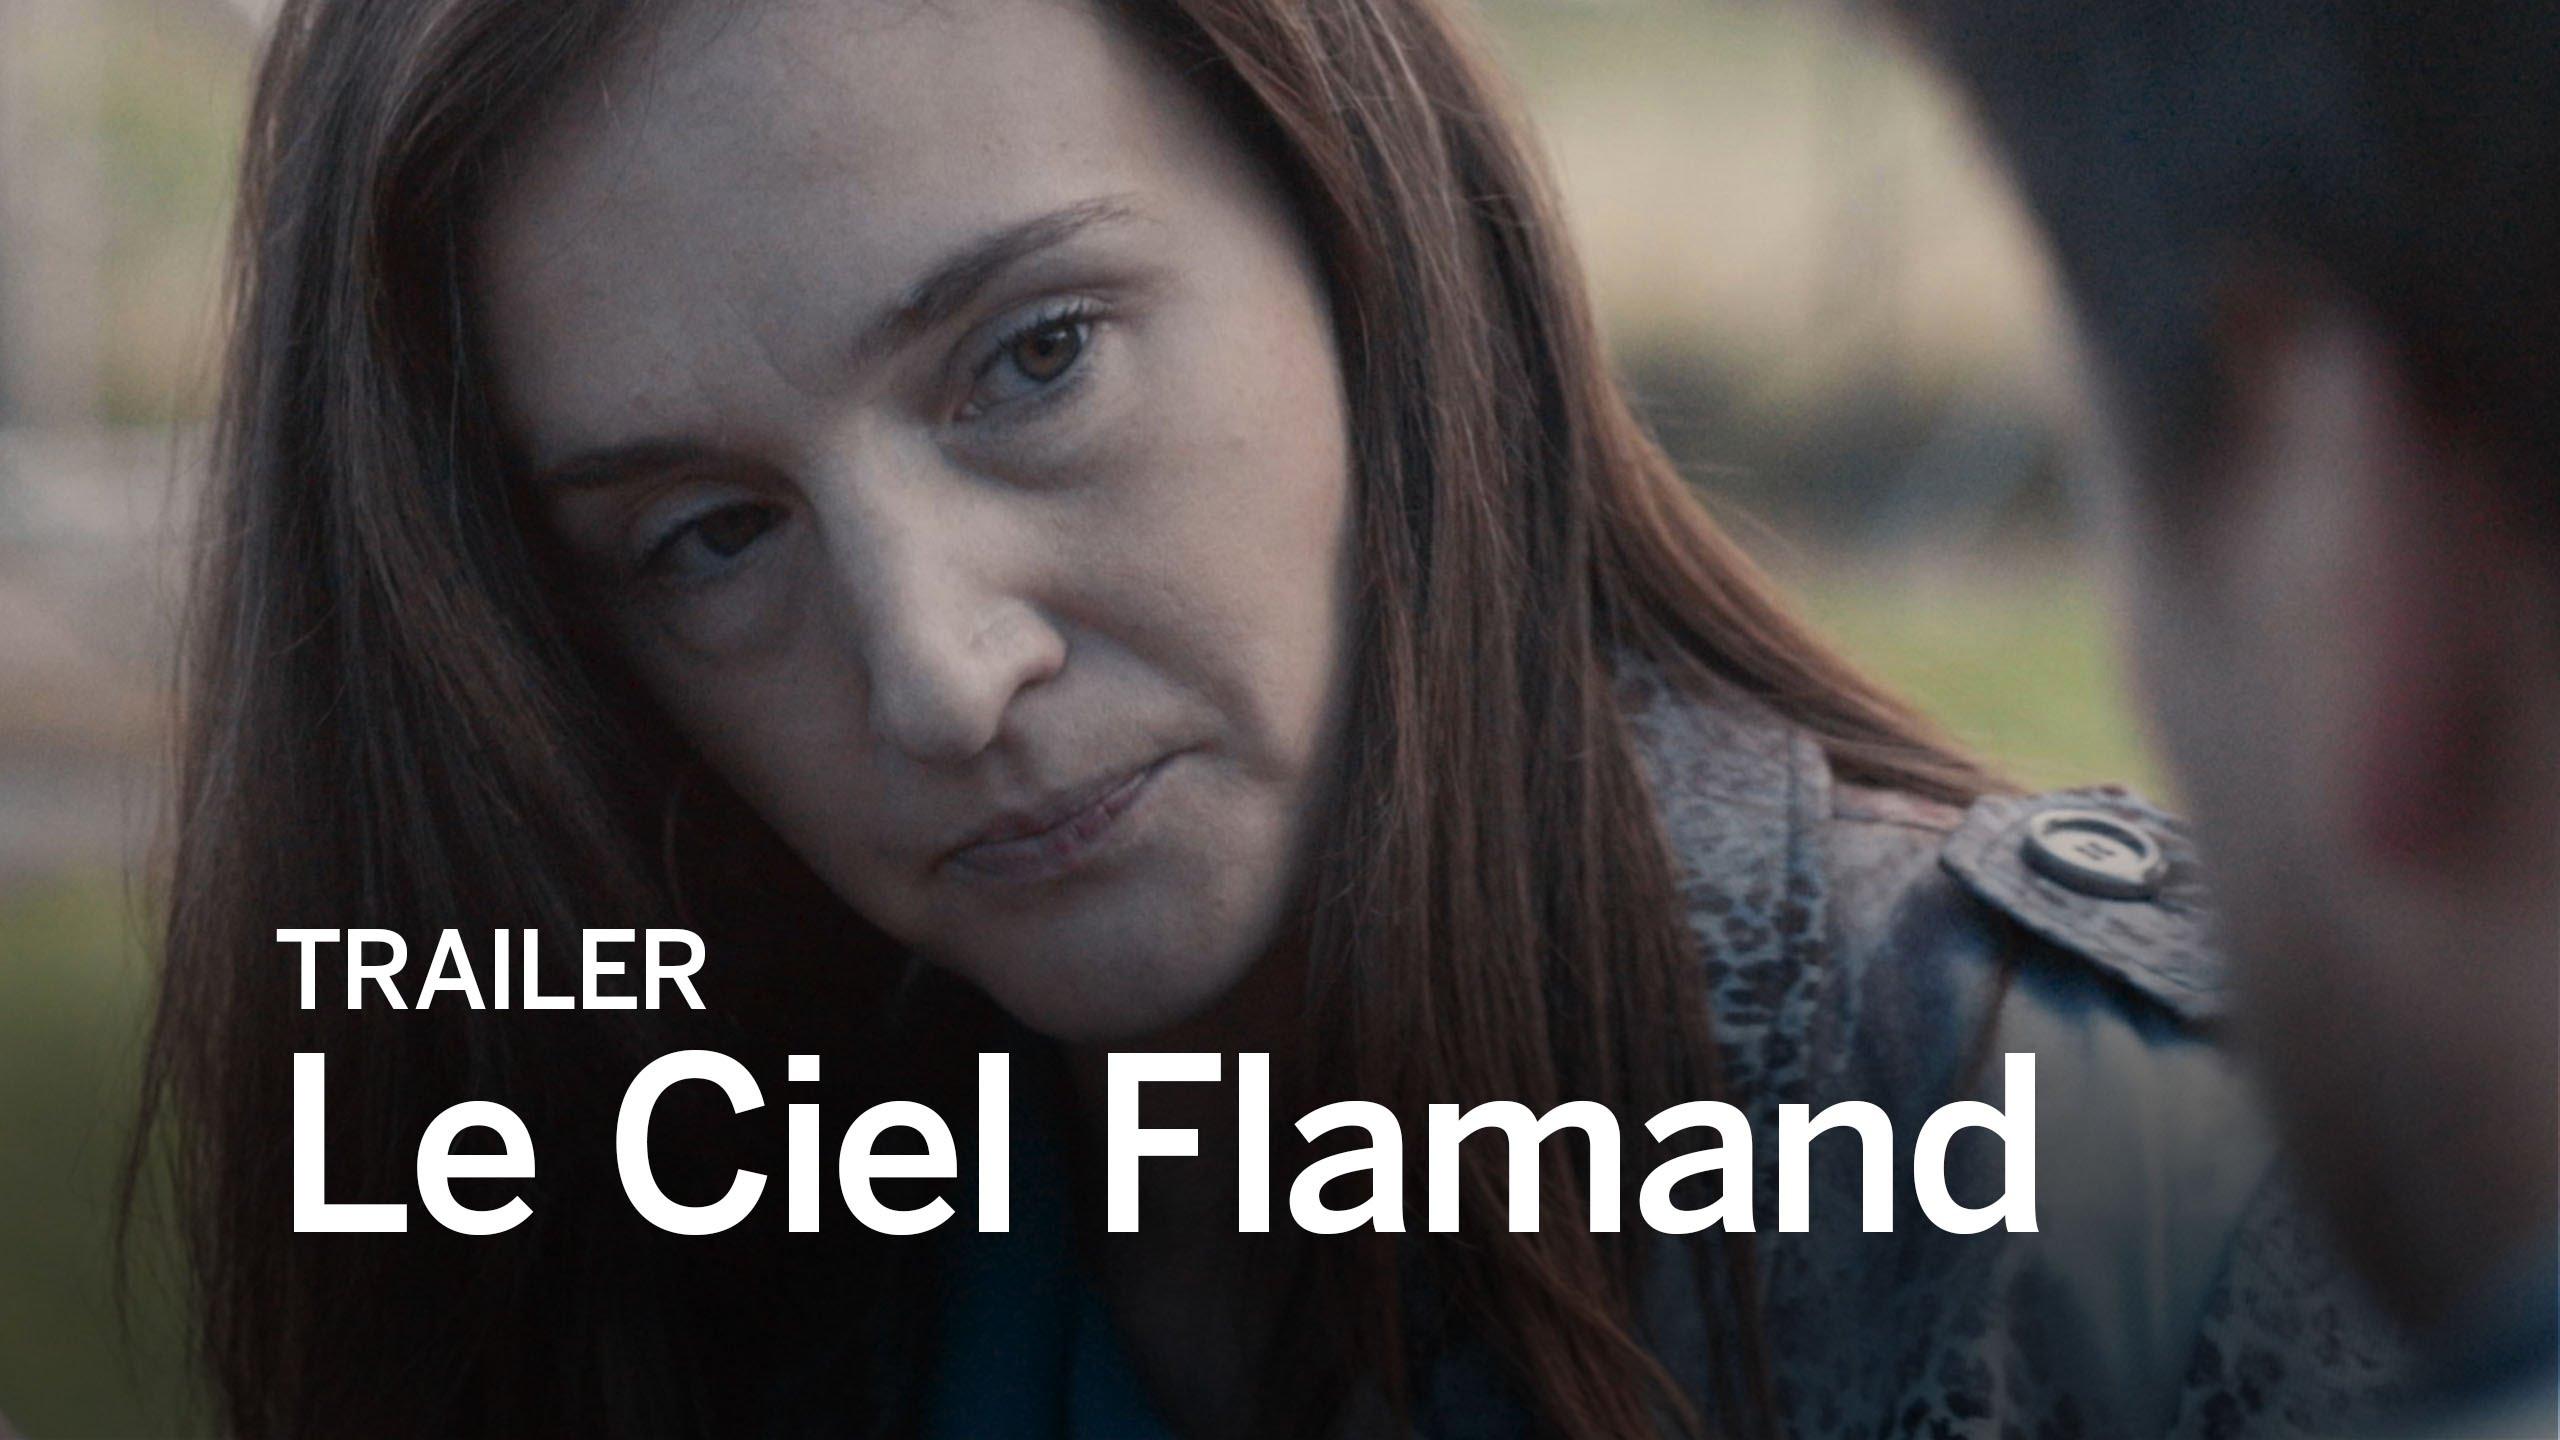 Le Ciel Flamand (2016) video/trailer